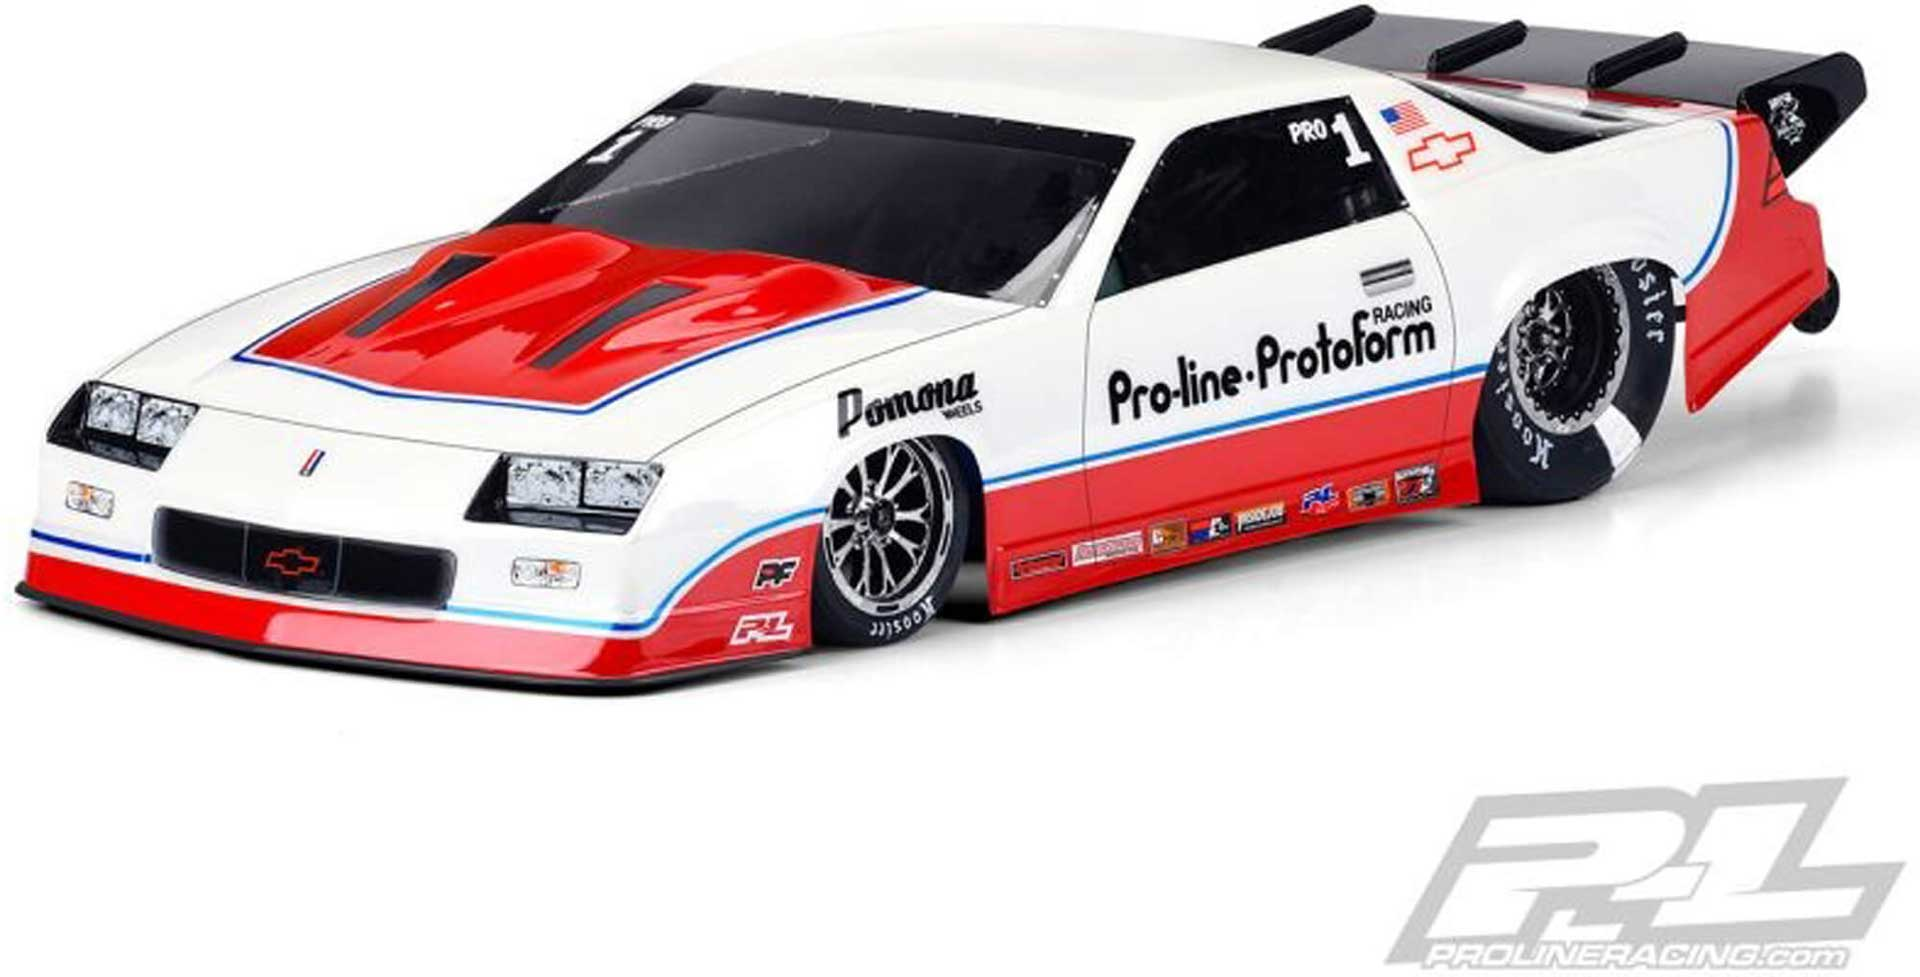 PROLINE 1985 Chevy Camaro Iroc-Z Karosserie für Slash 2WD Drag-Car (unlackiert)